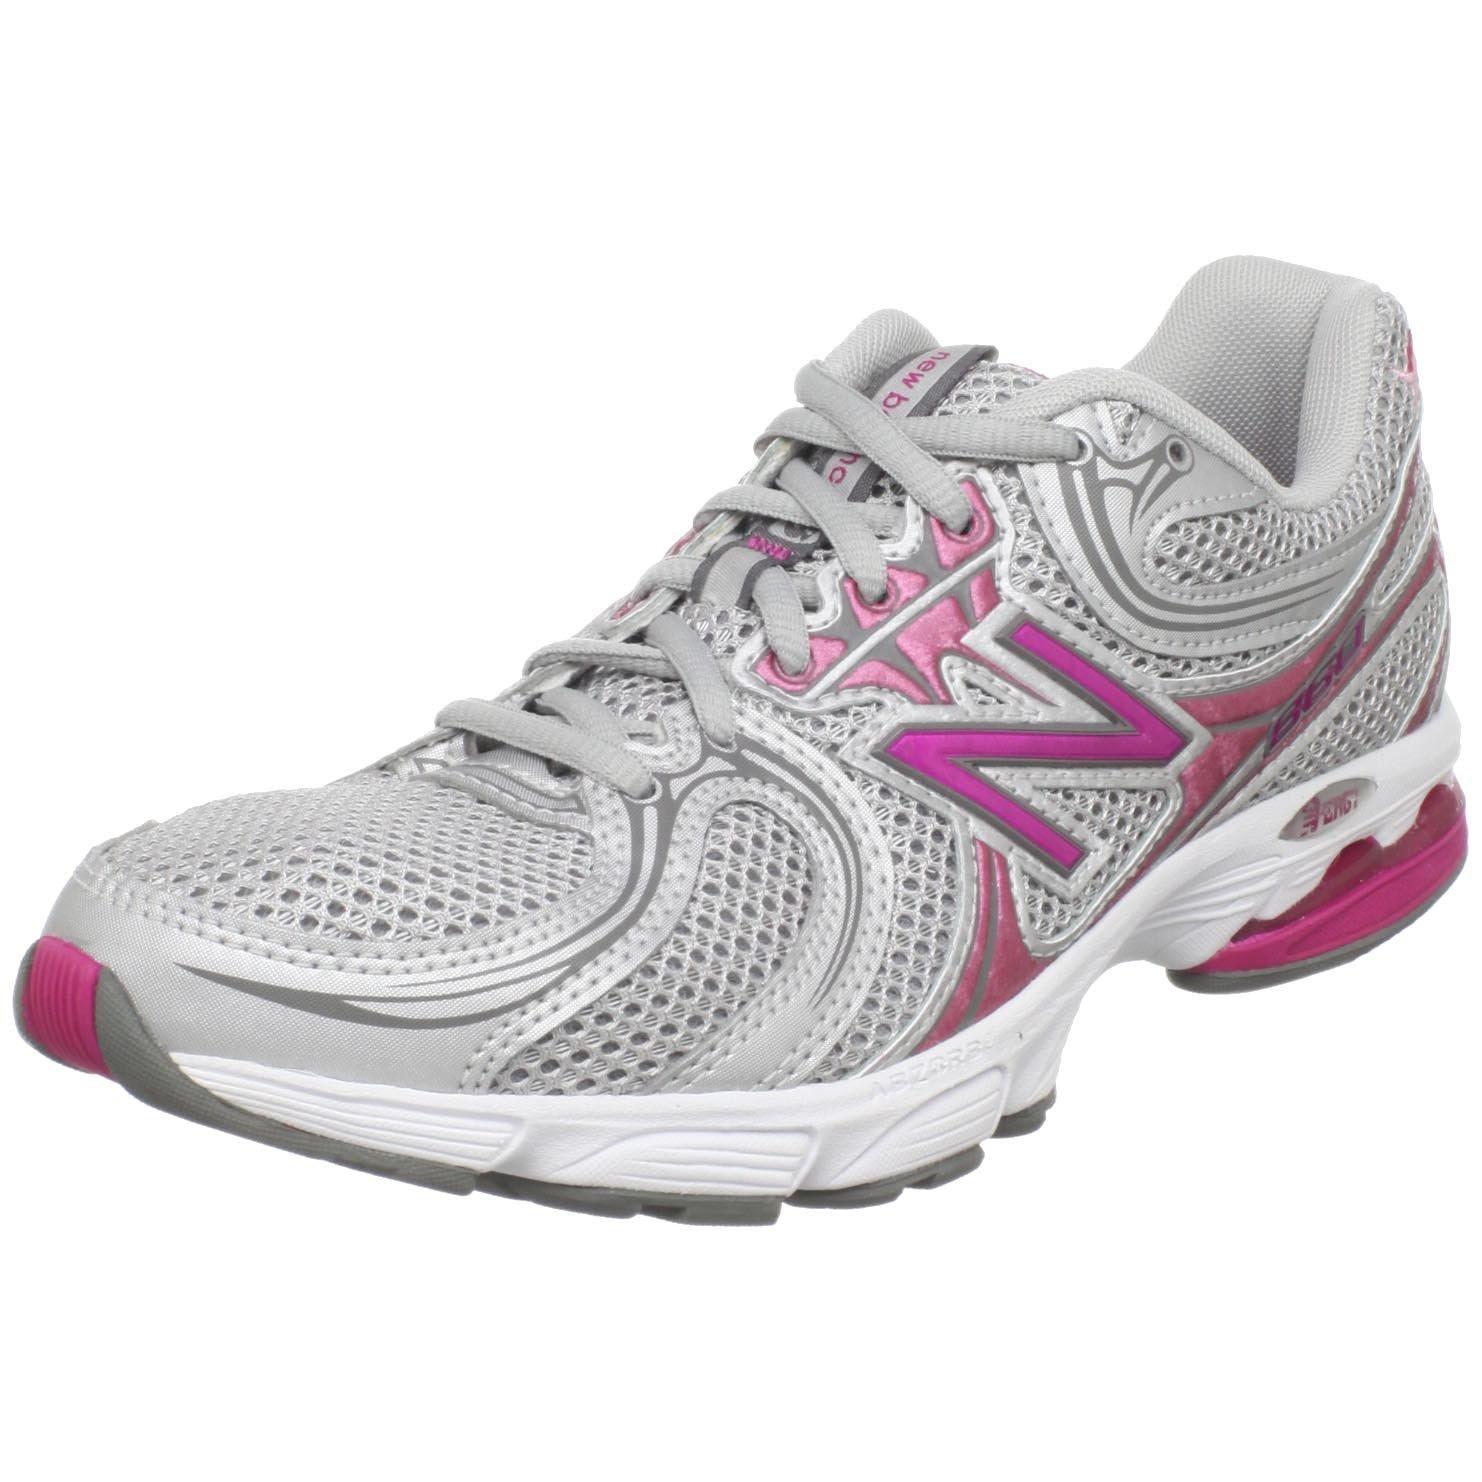 new balance womens ww860 walking shoe in gray silver pink